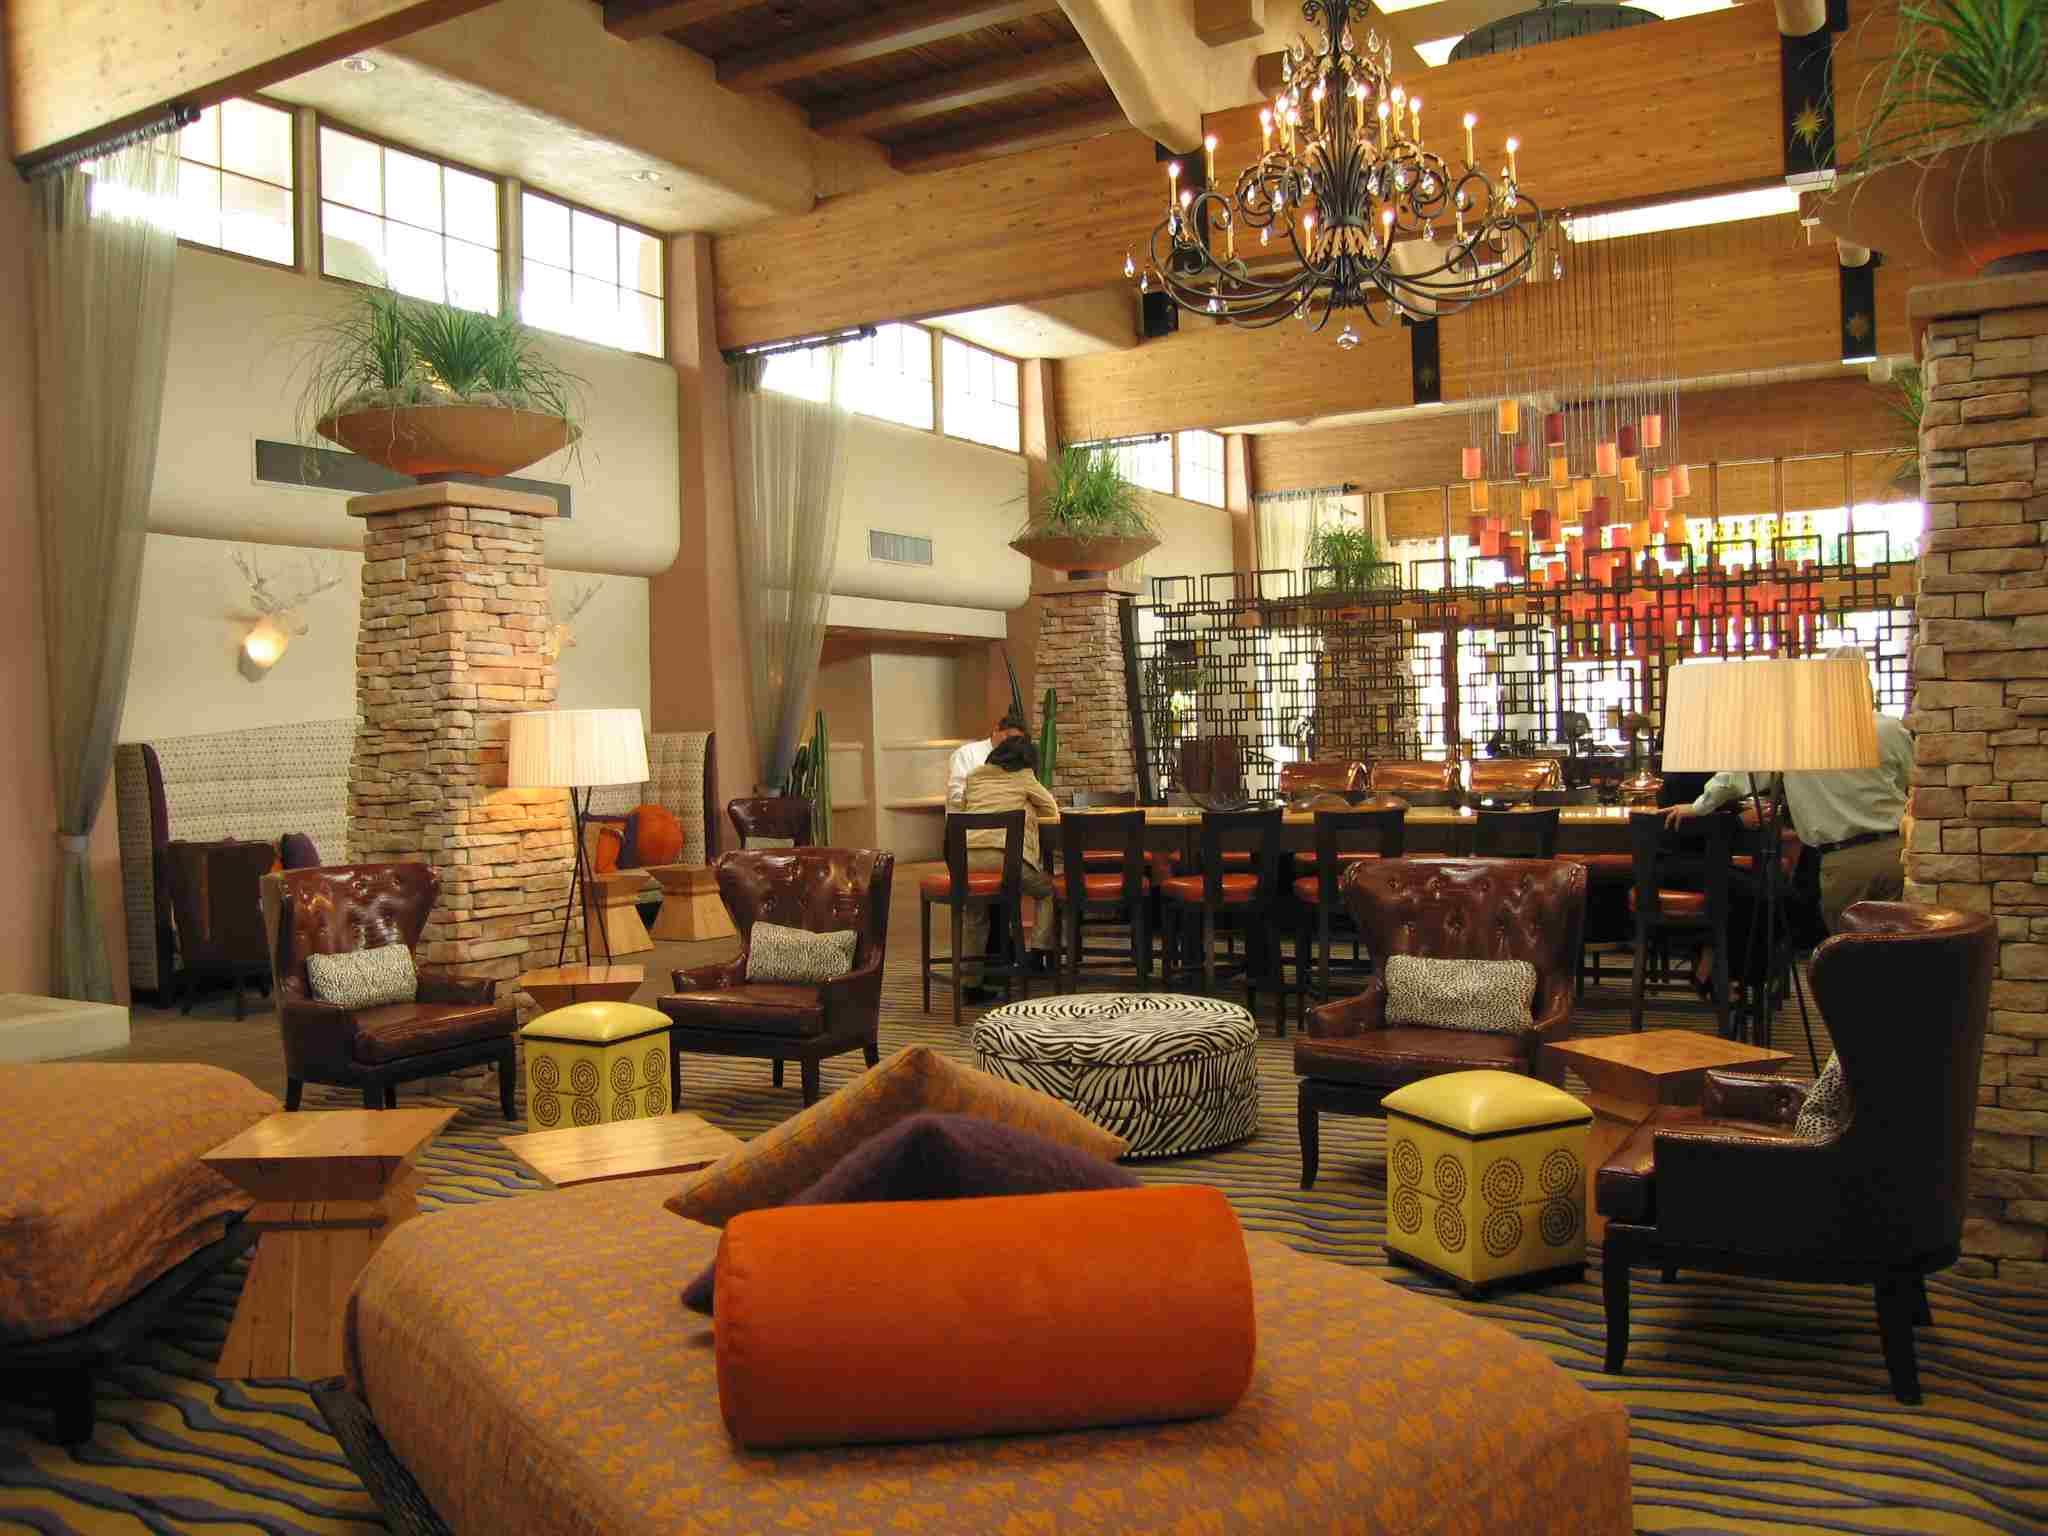 Interior of Taggia Restaurant inside FireSky Resort & Spa, Scottsdale, AZ.  High-